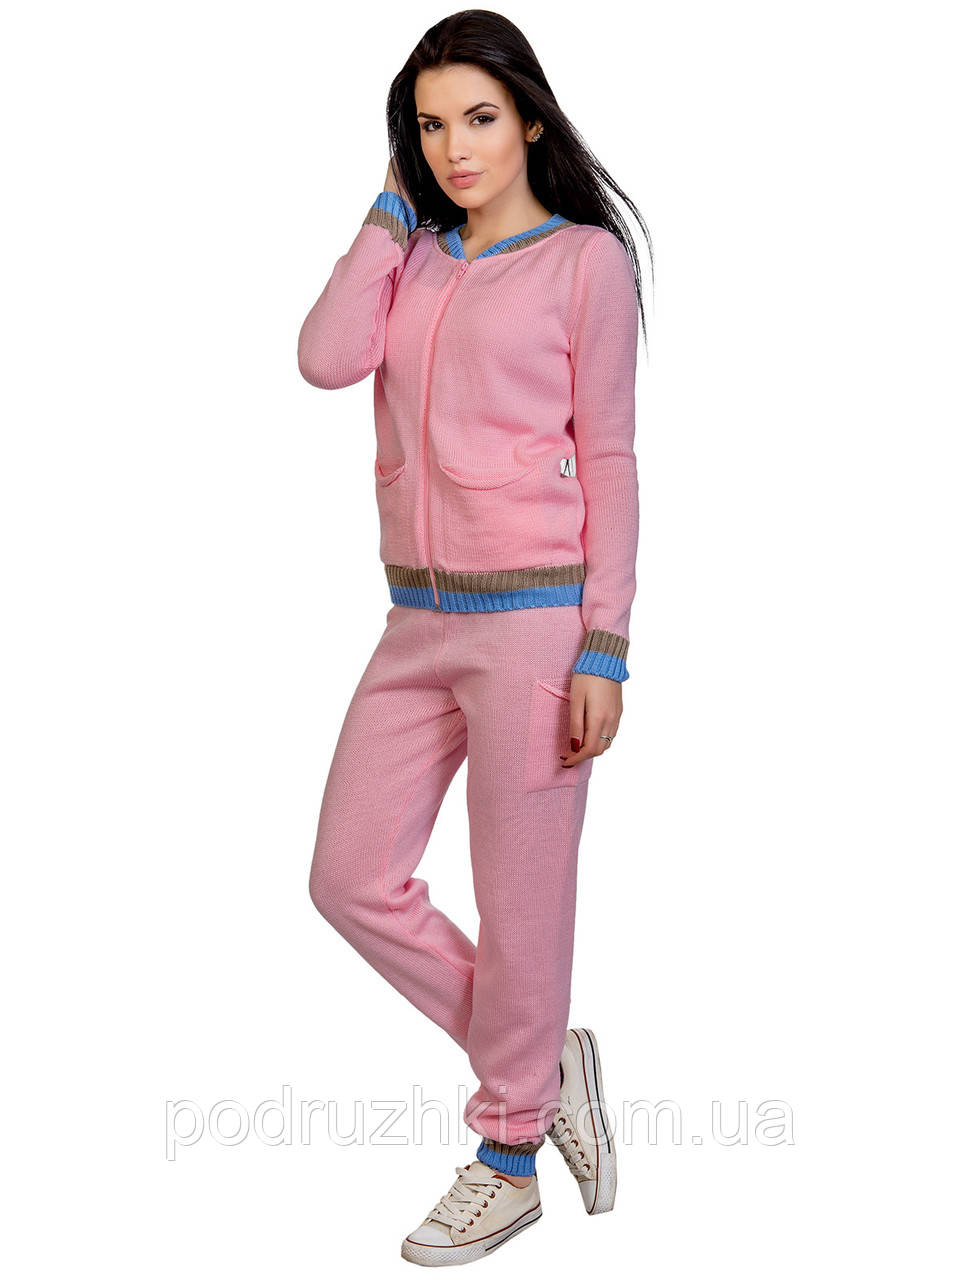 c05db44a79e8 Женский спортивный костюм из вязаного трикотажа - Интернет-магазин